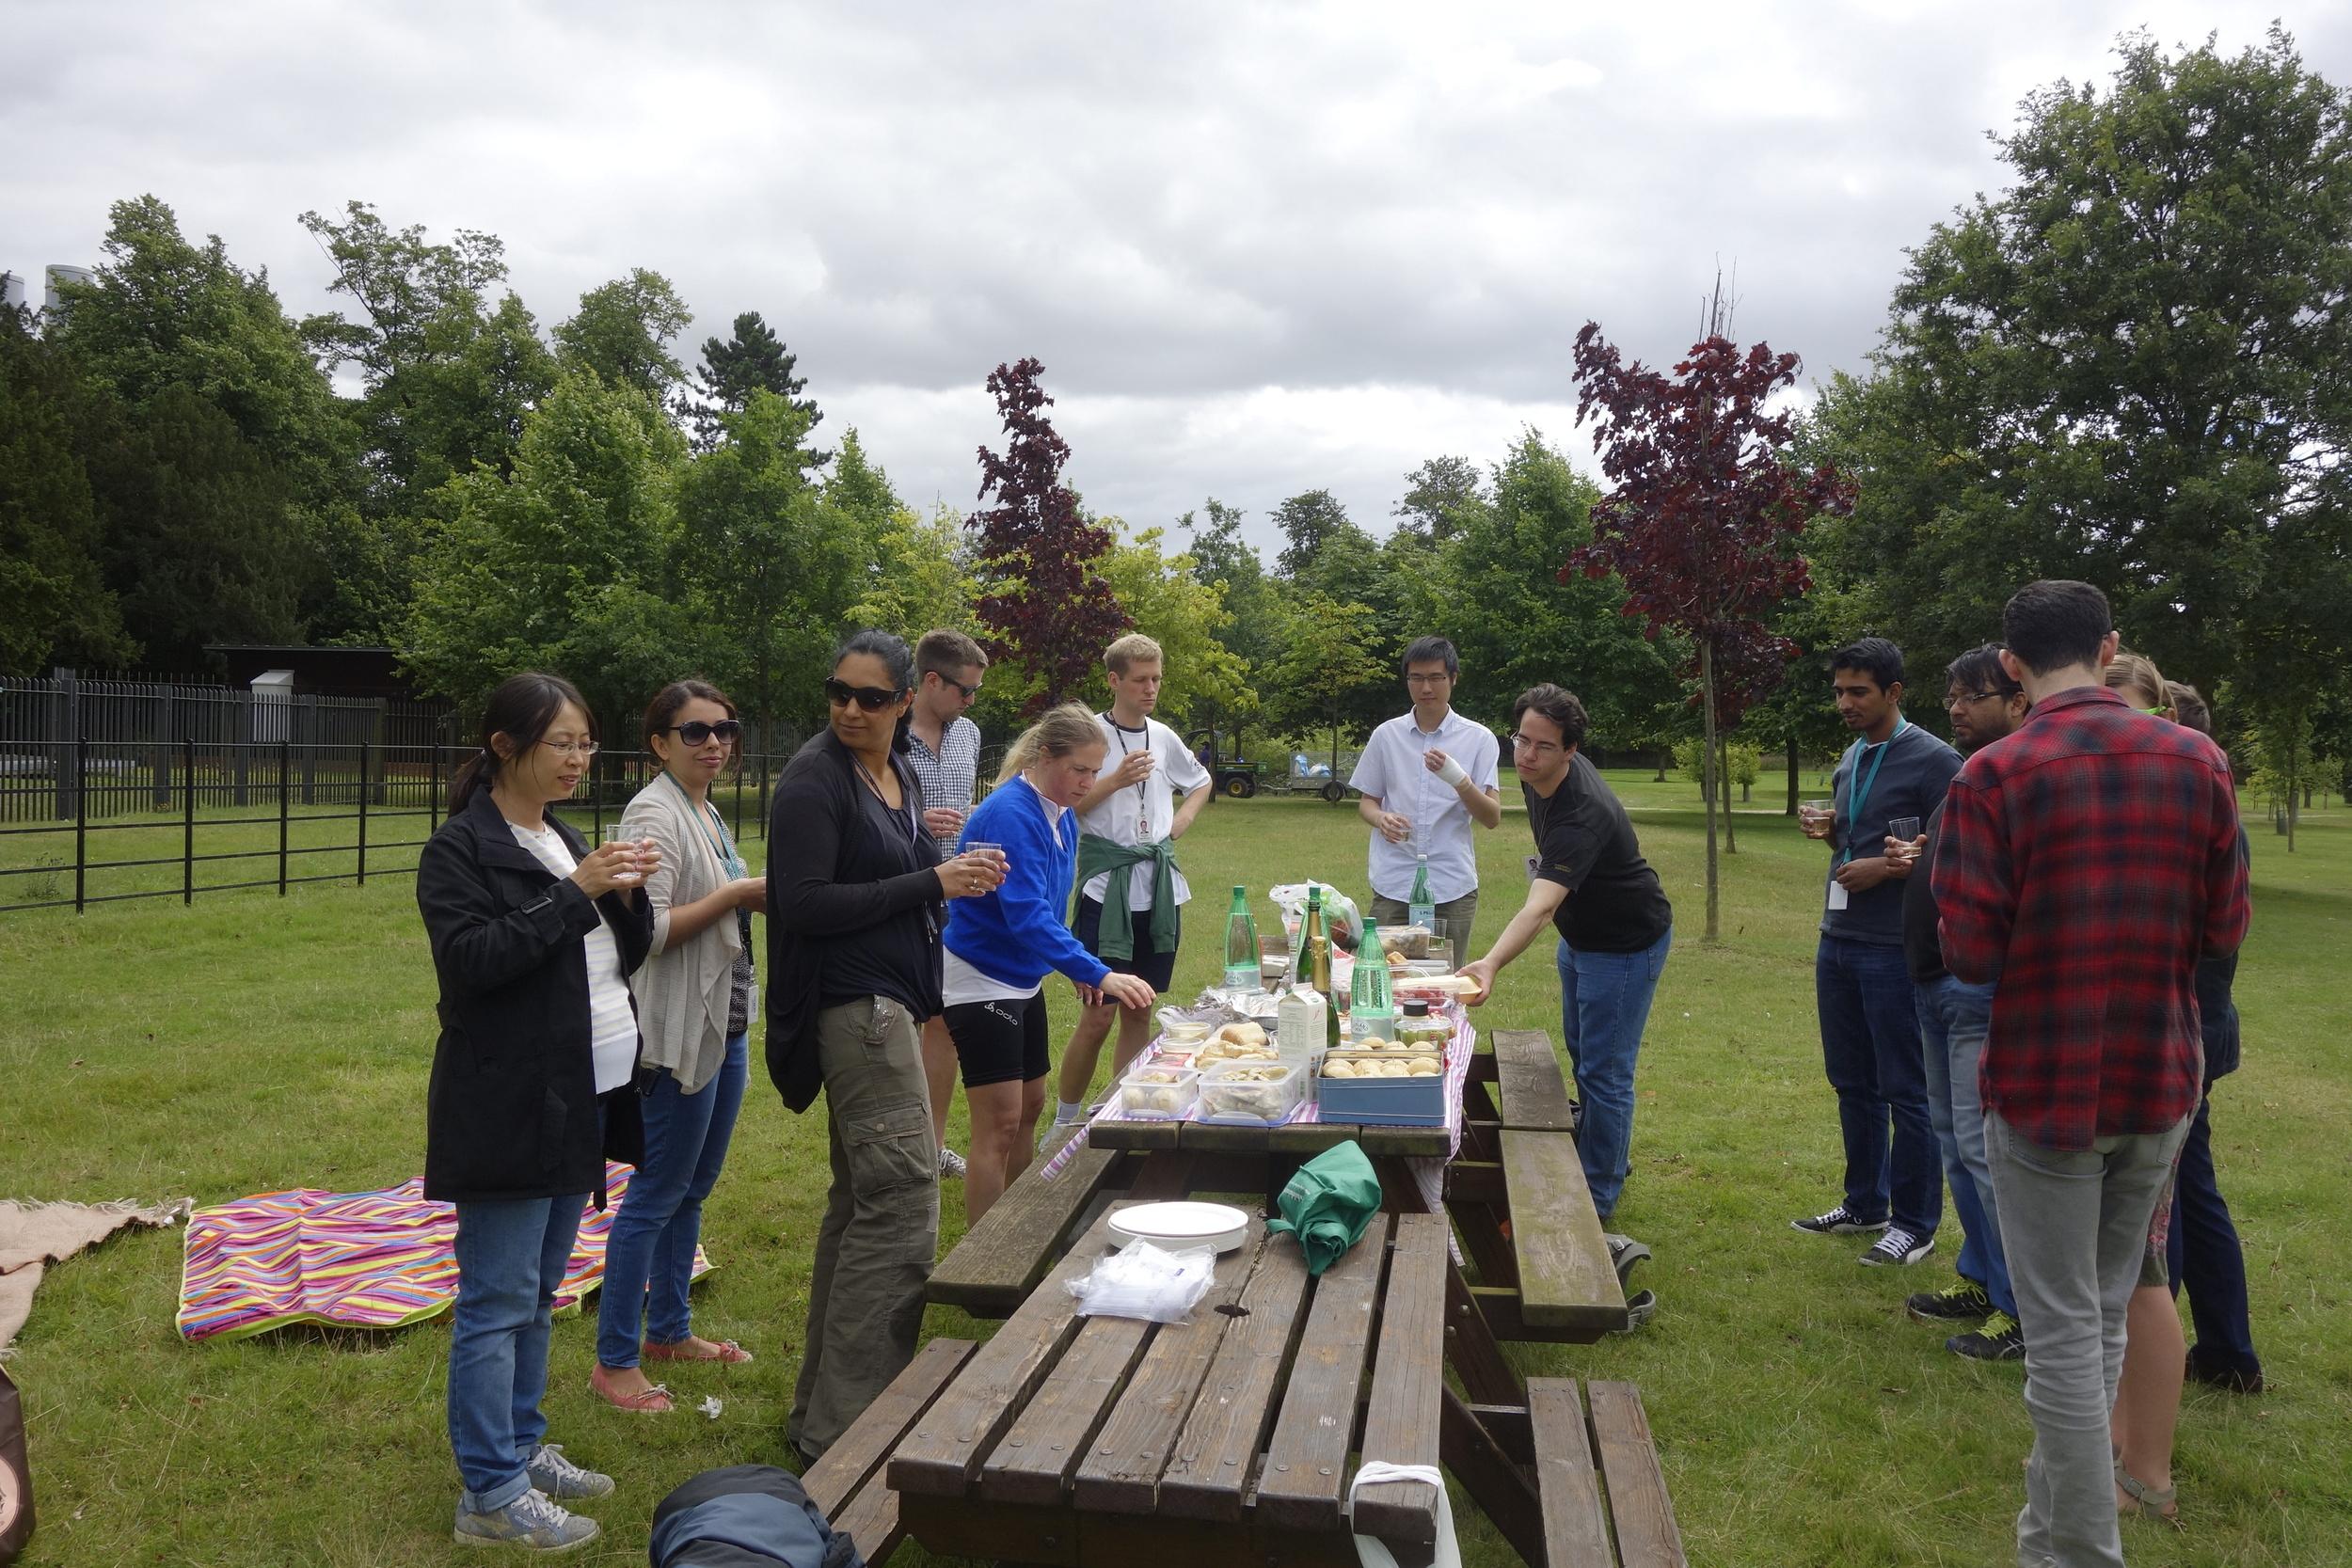 20150804_picnic_2.JPG